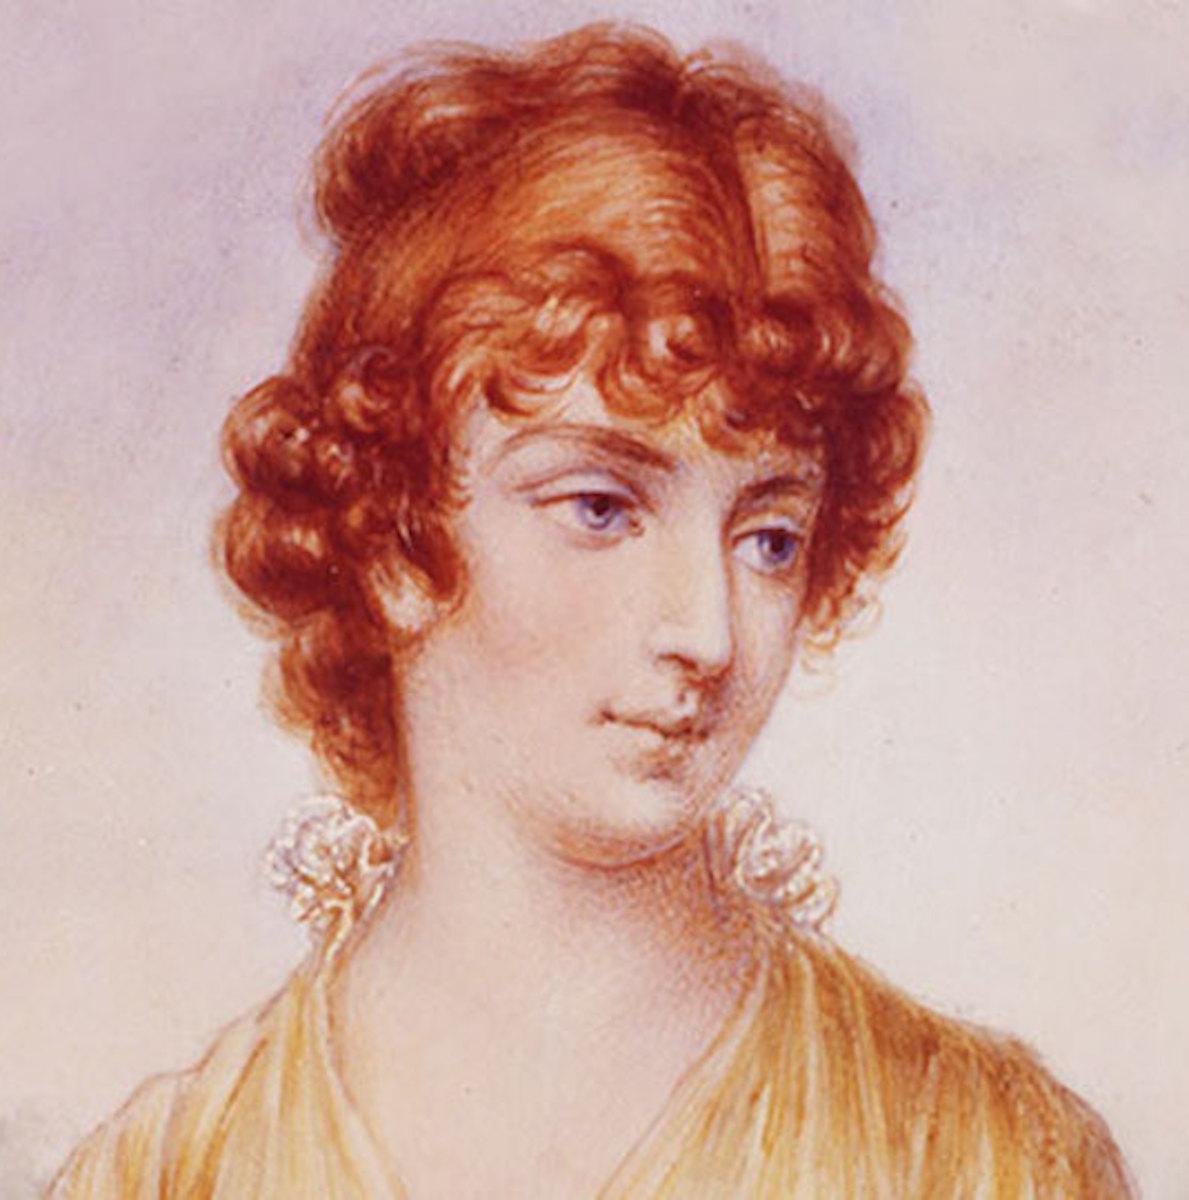 Martha Jefferson: The Third First Lady